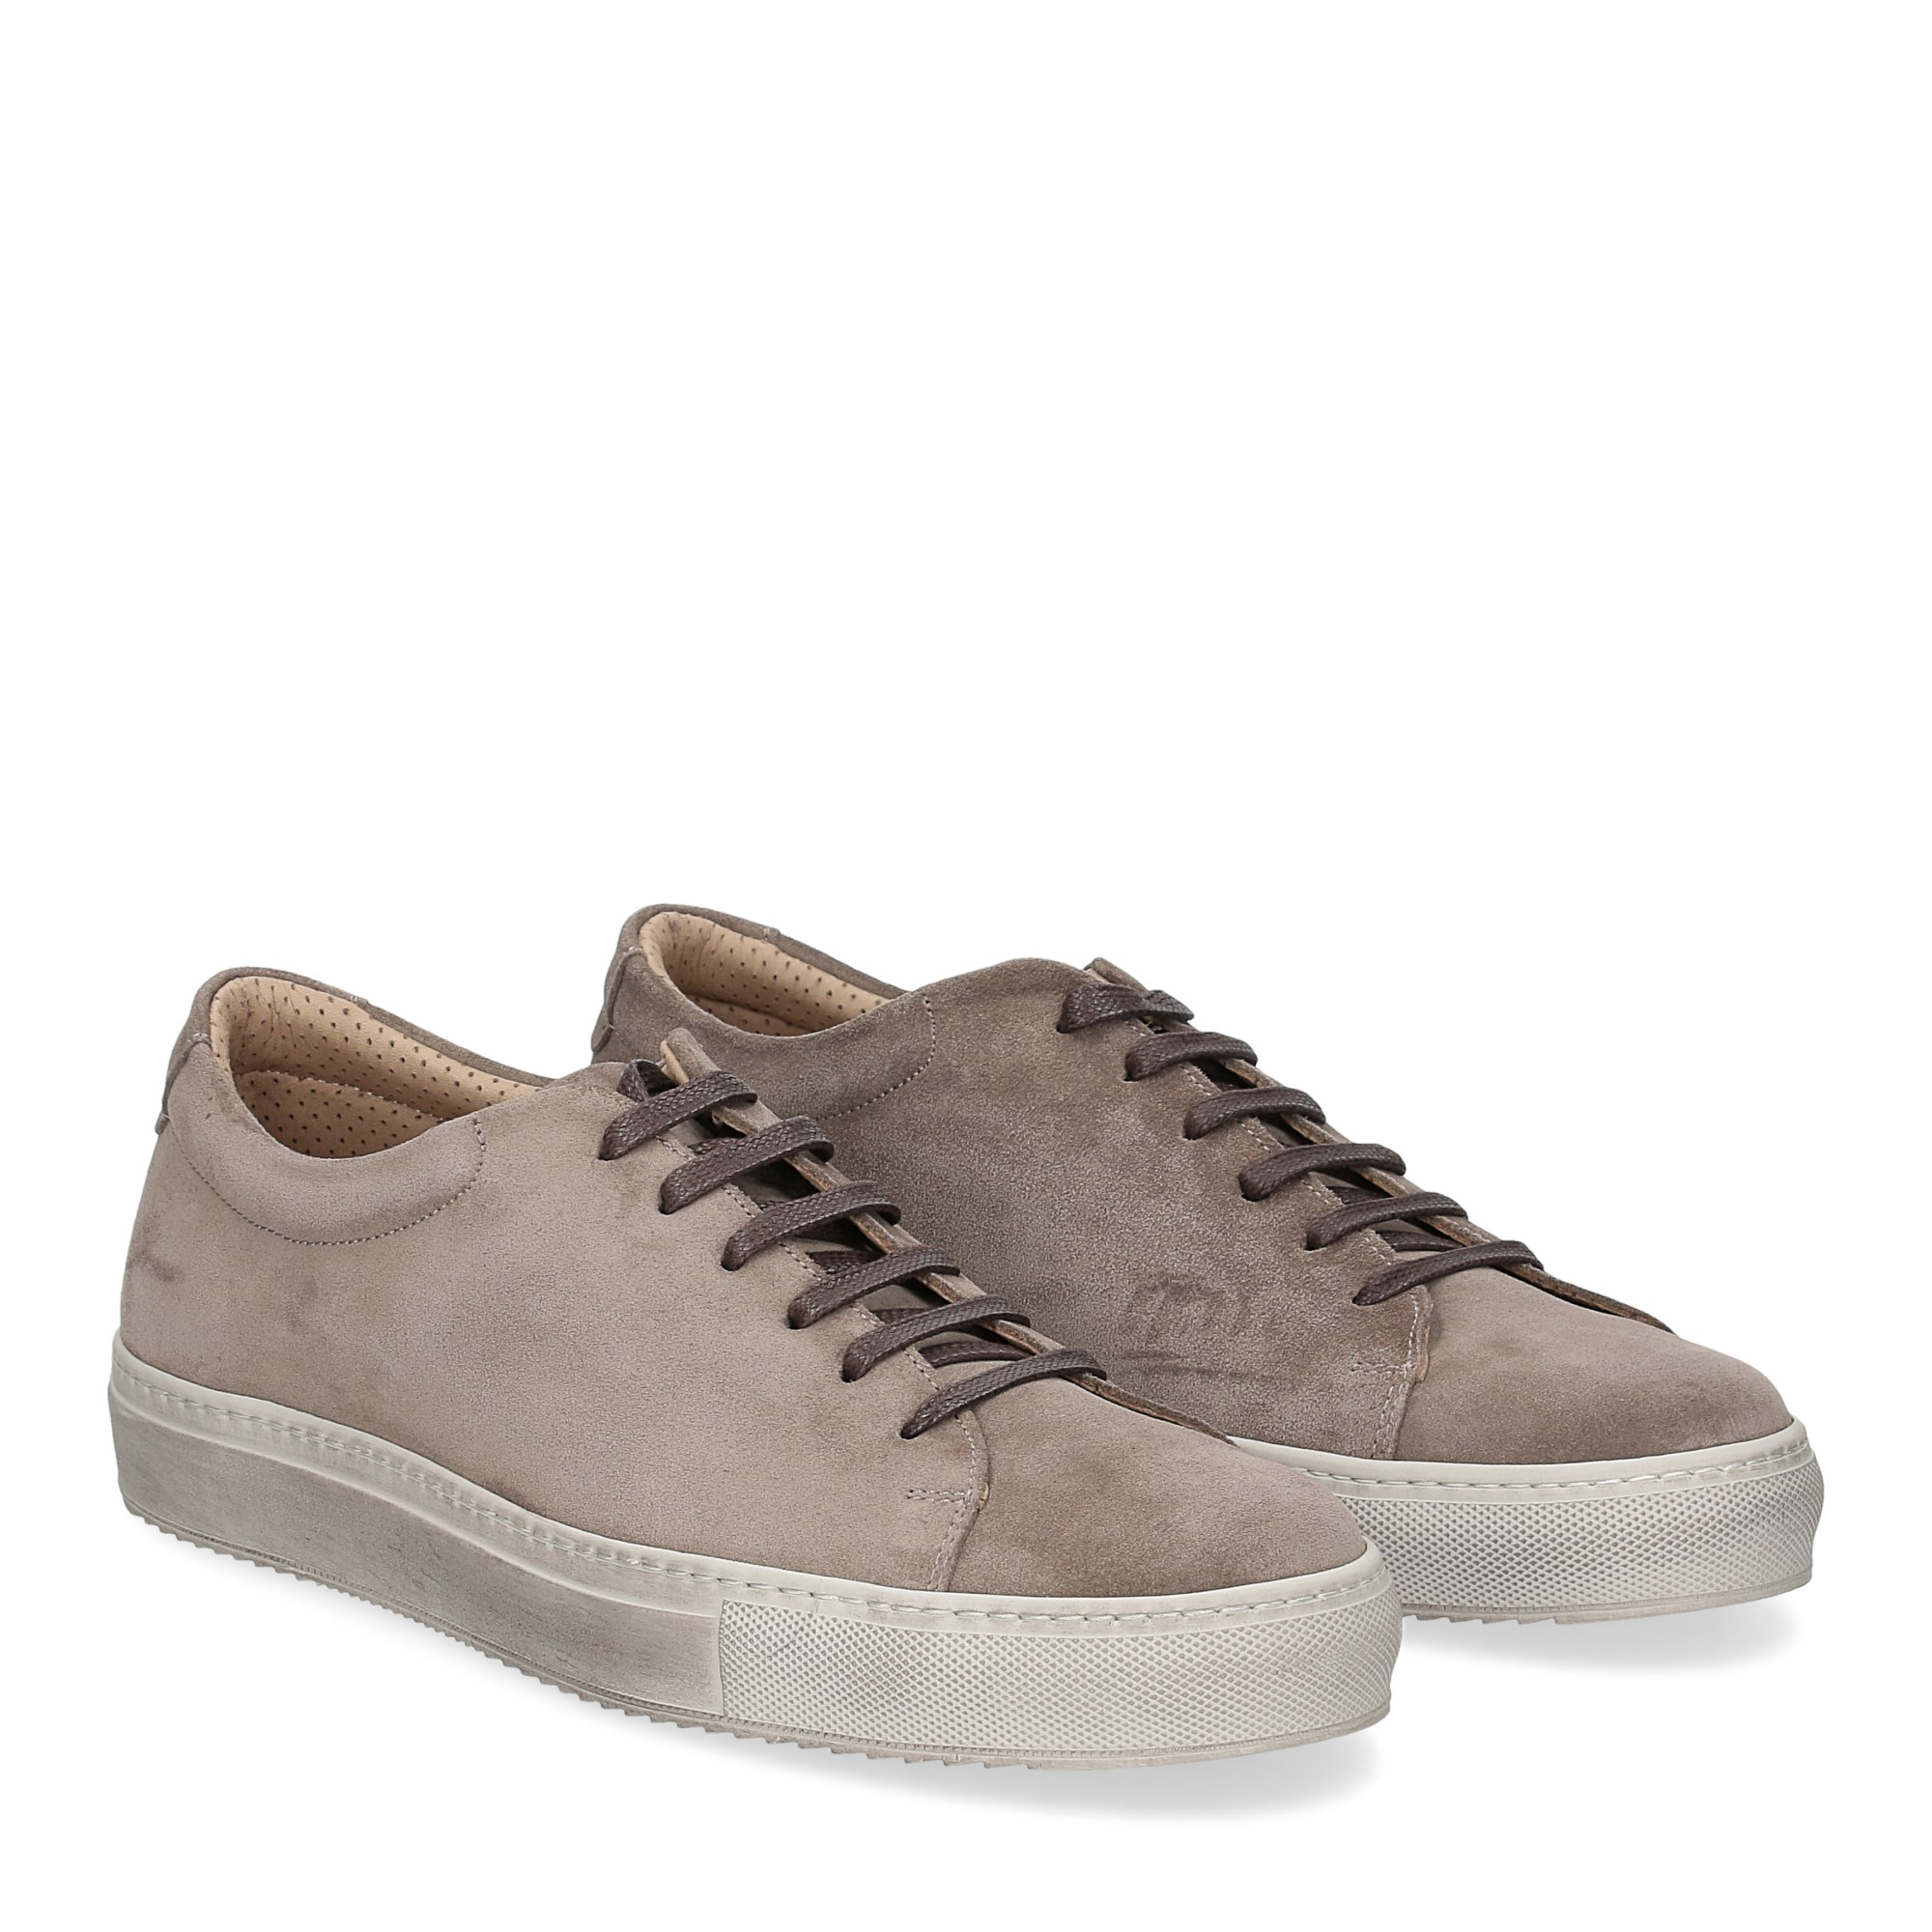 Griffi's sneaker 732 camoscio taupe